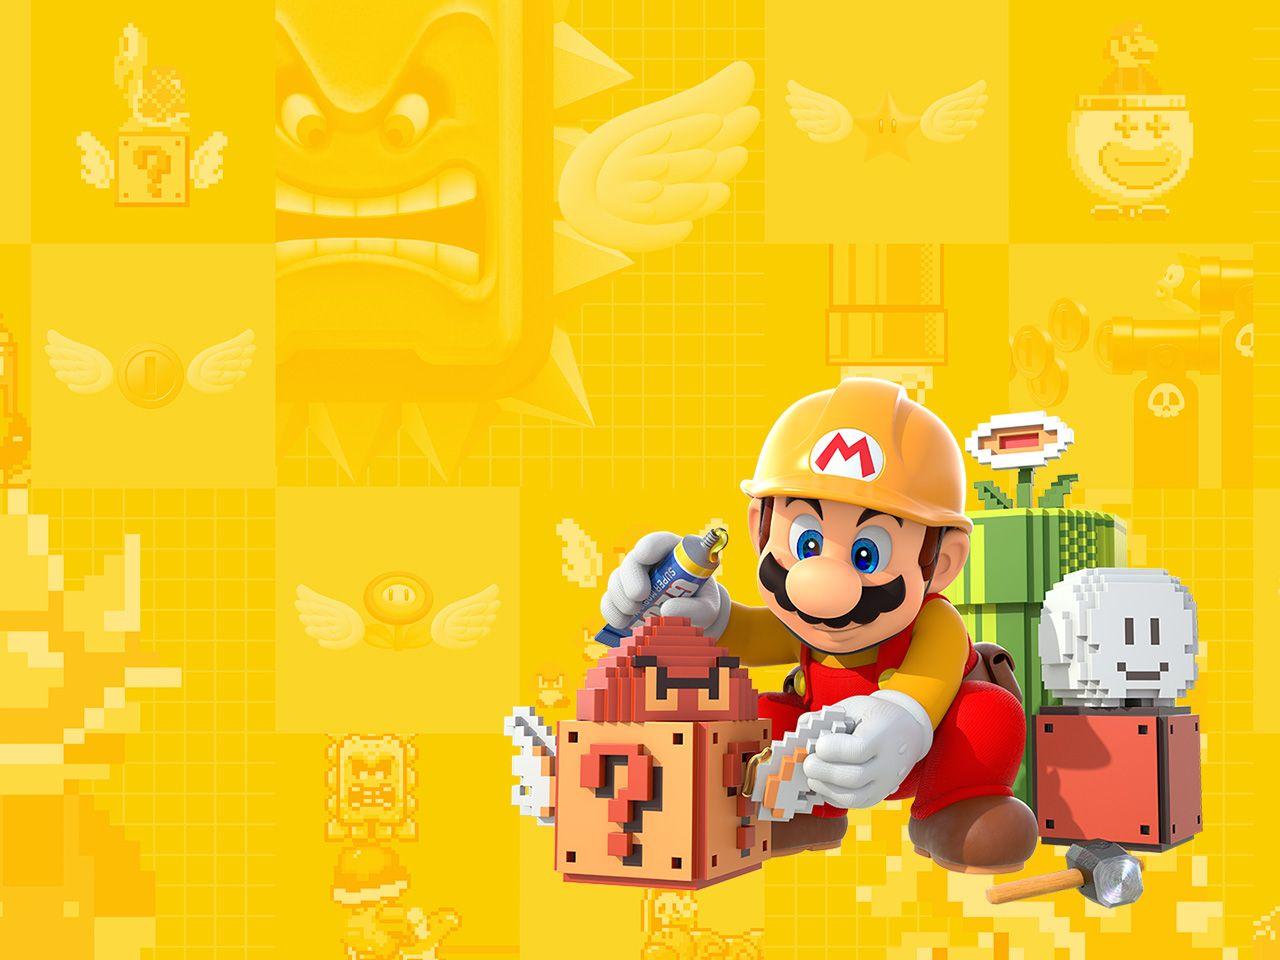 10 little secrets in Super Mario Maker that I like